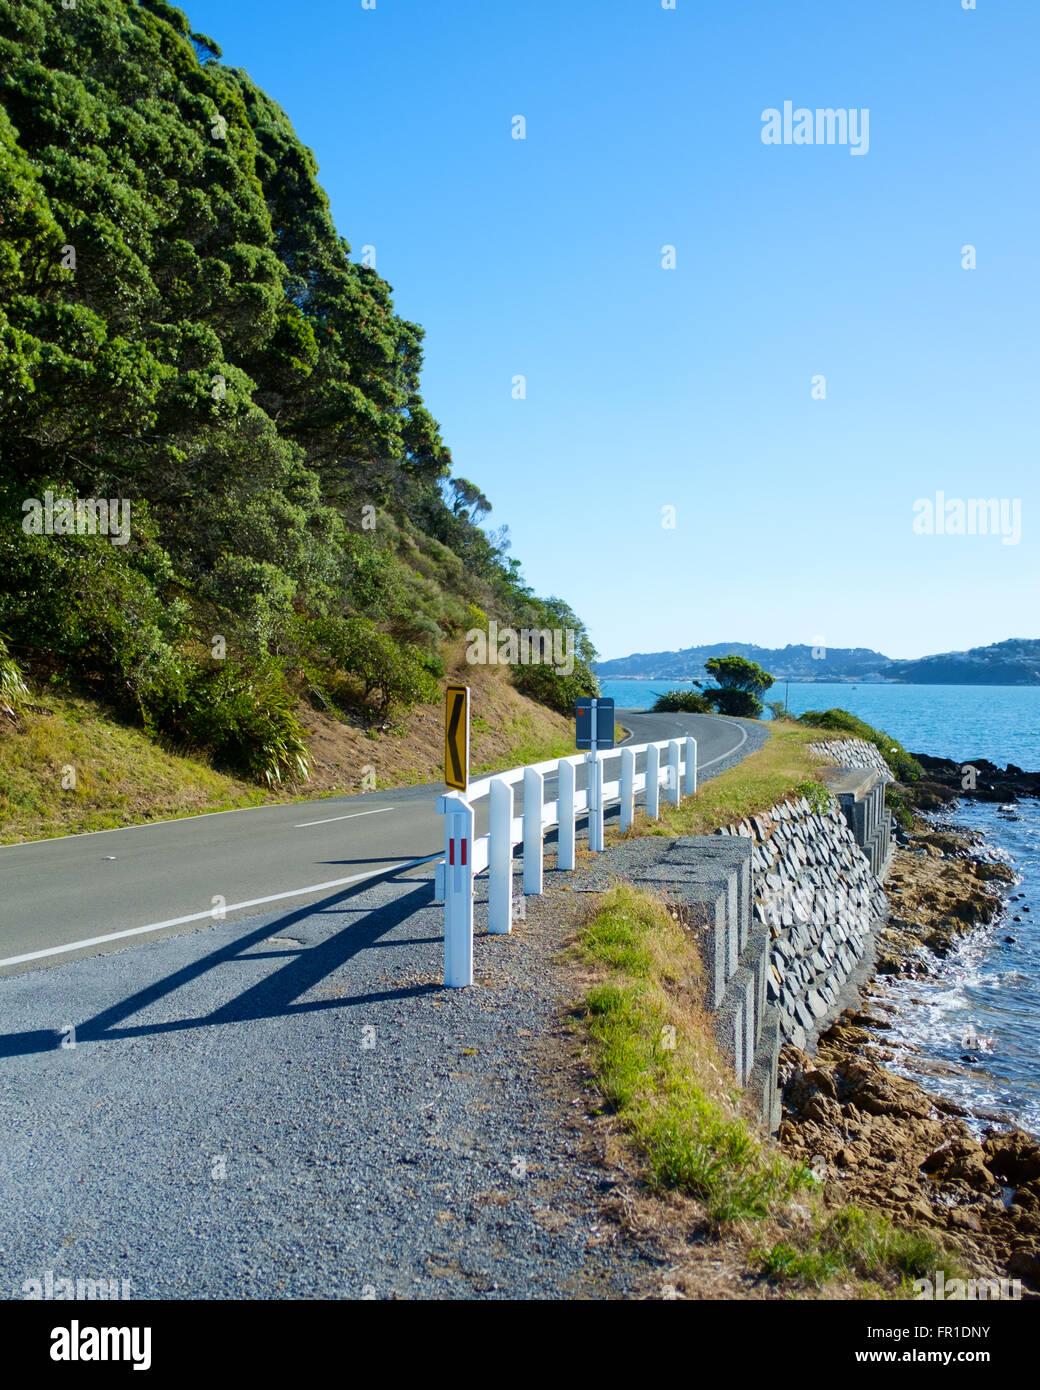 scenery at wellington bay new zealand stock photo 100221687 alamy